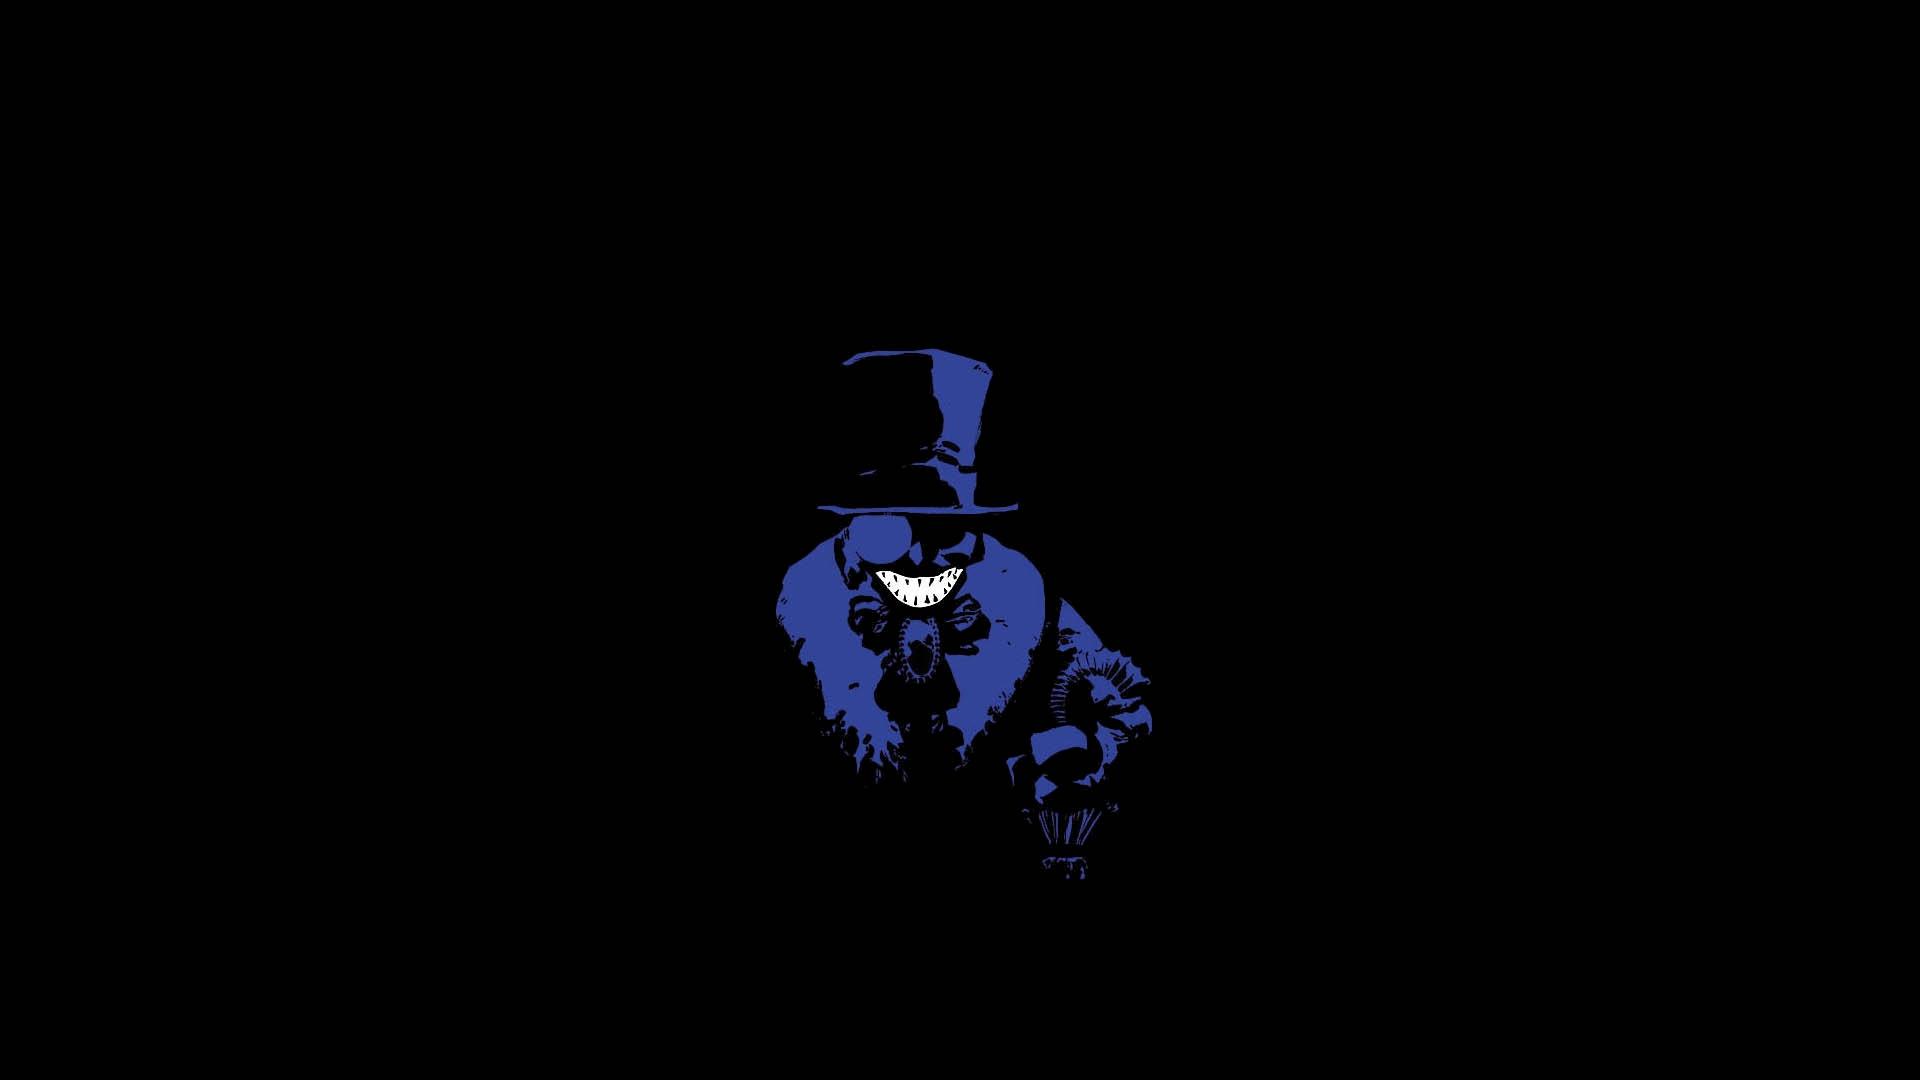 Batman Dark Victory HD Wallpaper Background Image 1920x1080 1920x1080